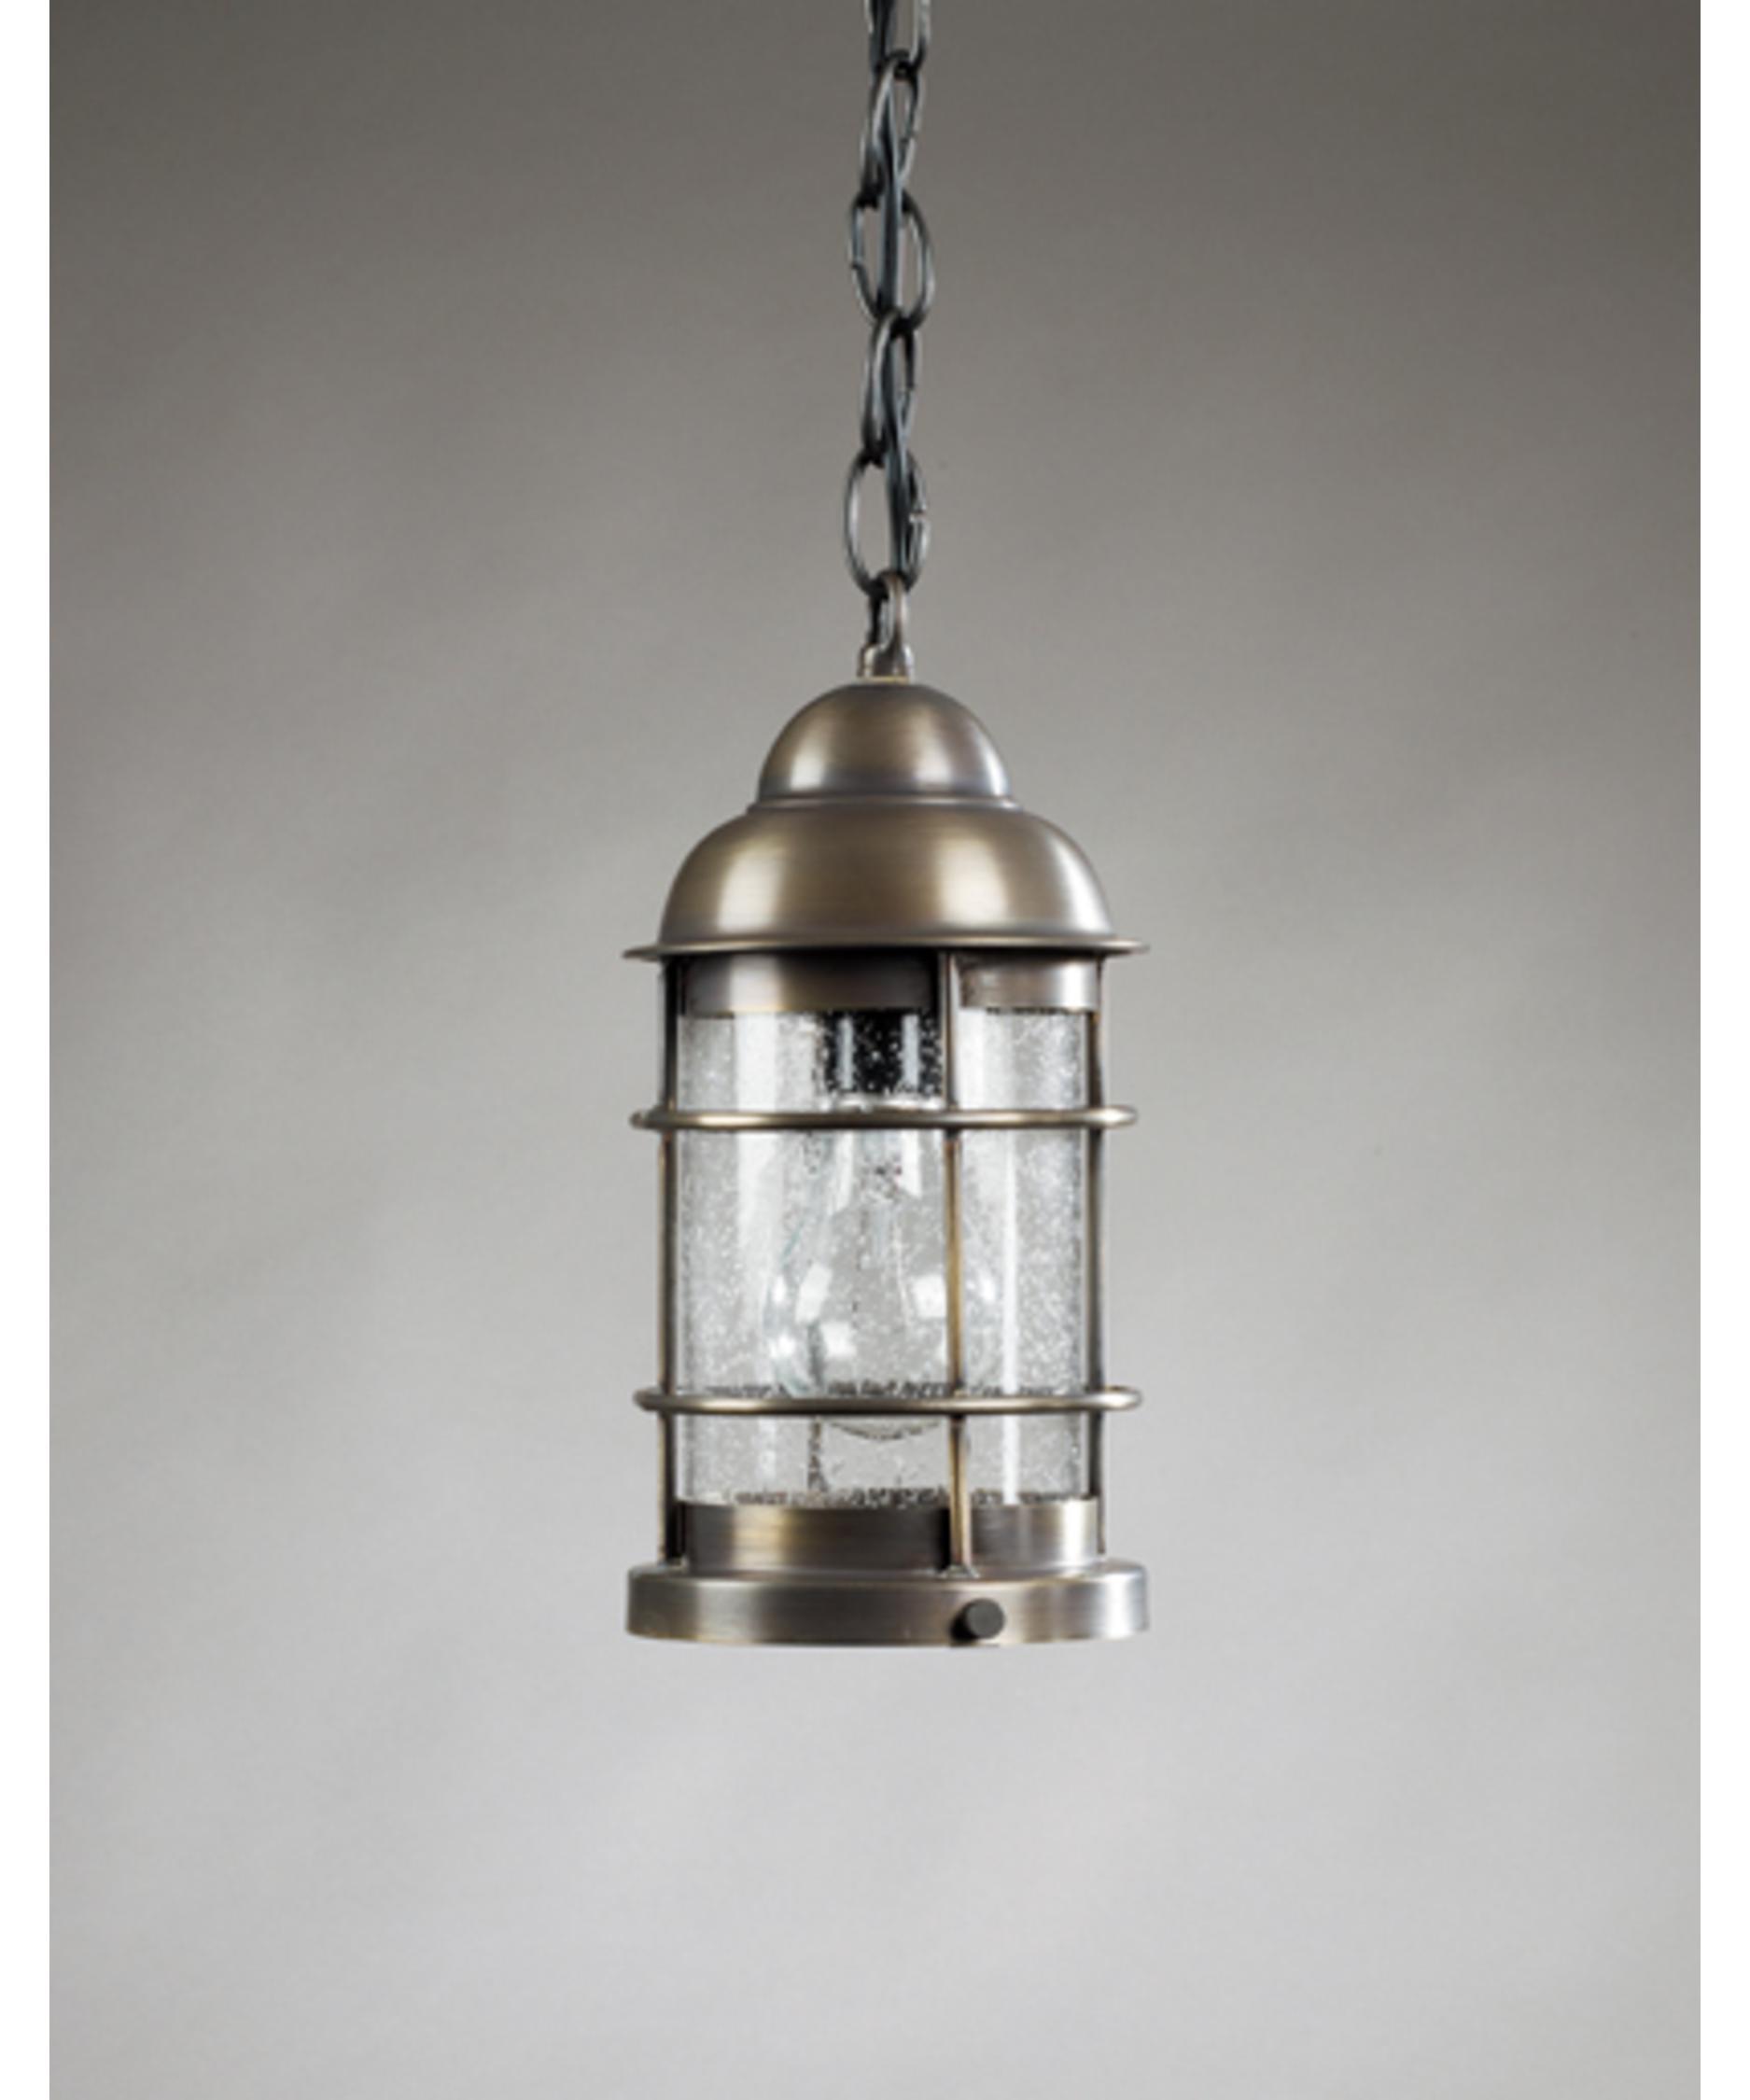 Delightful Northeast Lantern 3512 MED Nautical 6 Inch Wide 1 Light Outdoor Hanging  Lantern | Capitol Lighting 1 800lighting.com